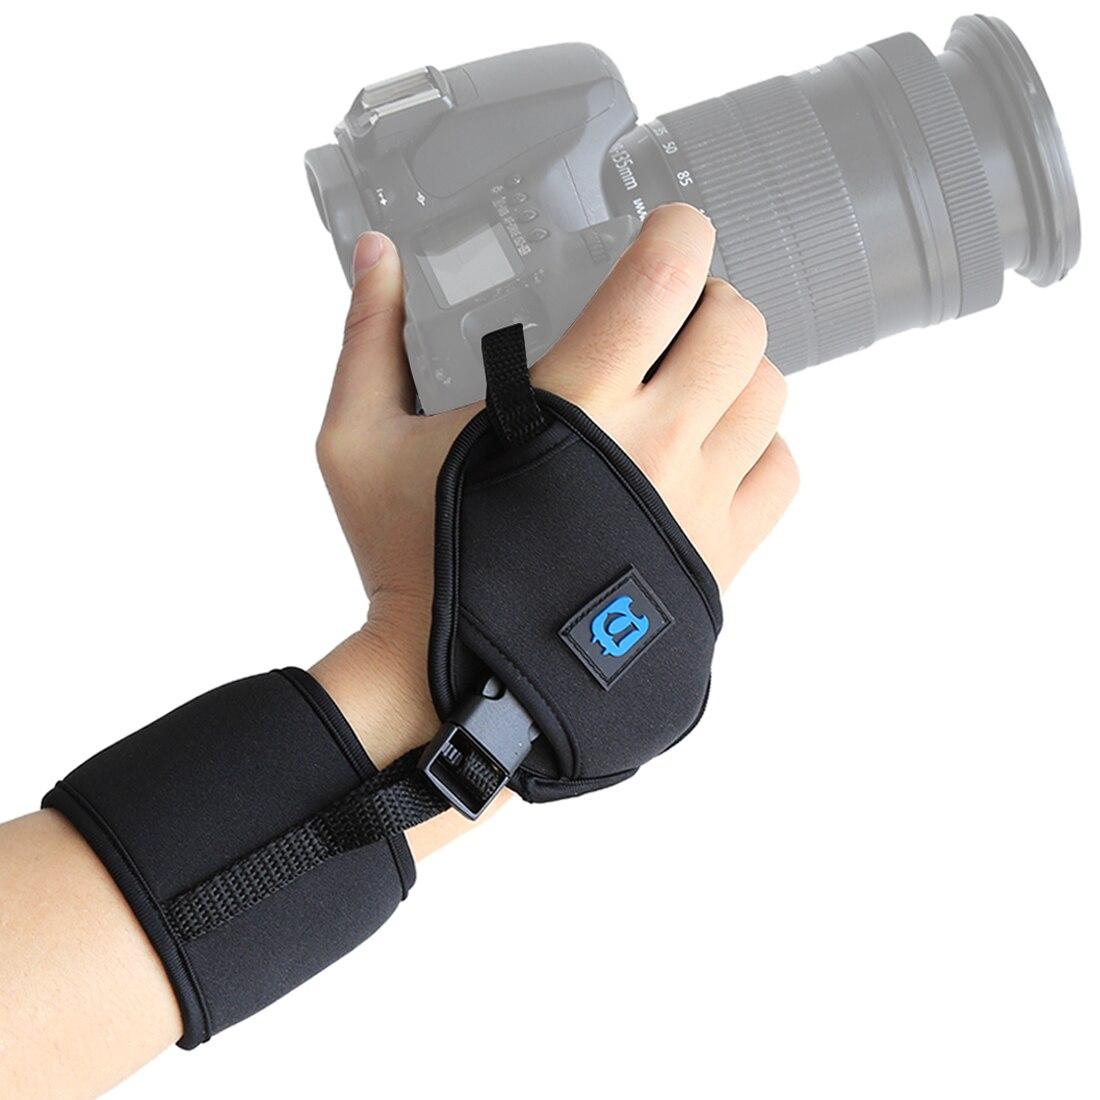 General Hand Wrist Strap Camera Neoprene Cameras Wrist Strap Hand Belt Quick-release 1/4'' Screw For NIKON Canon